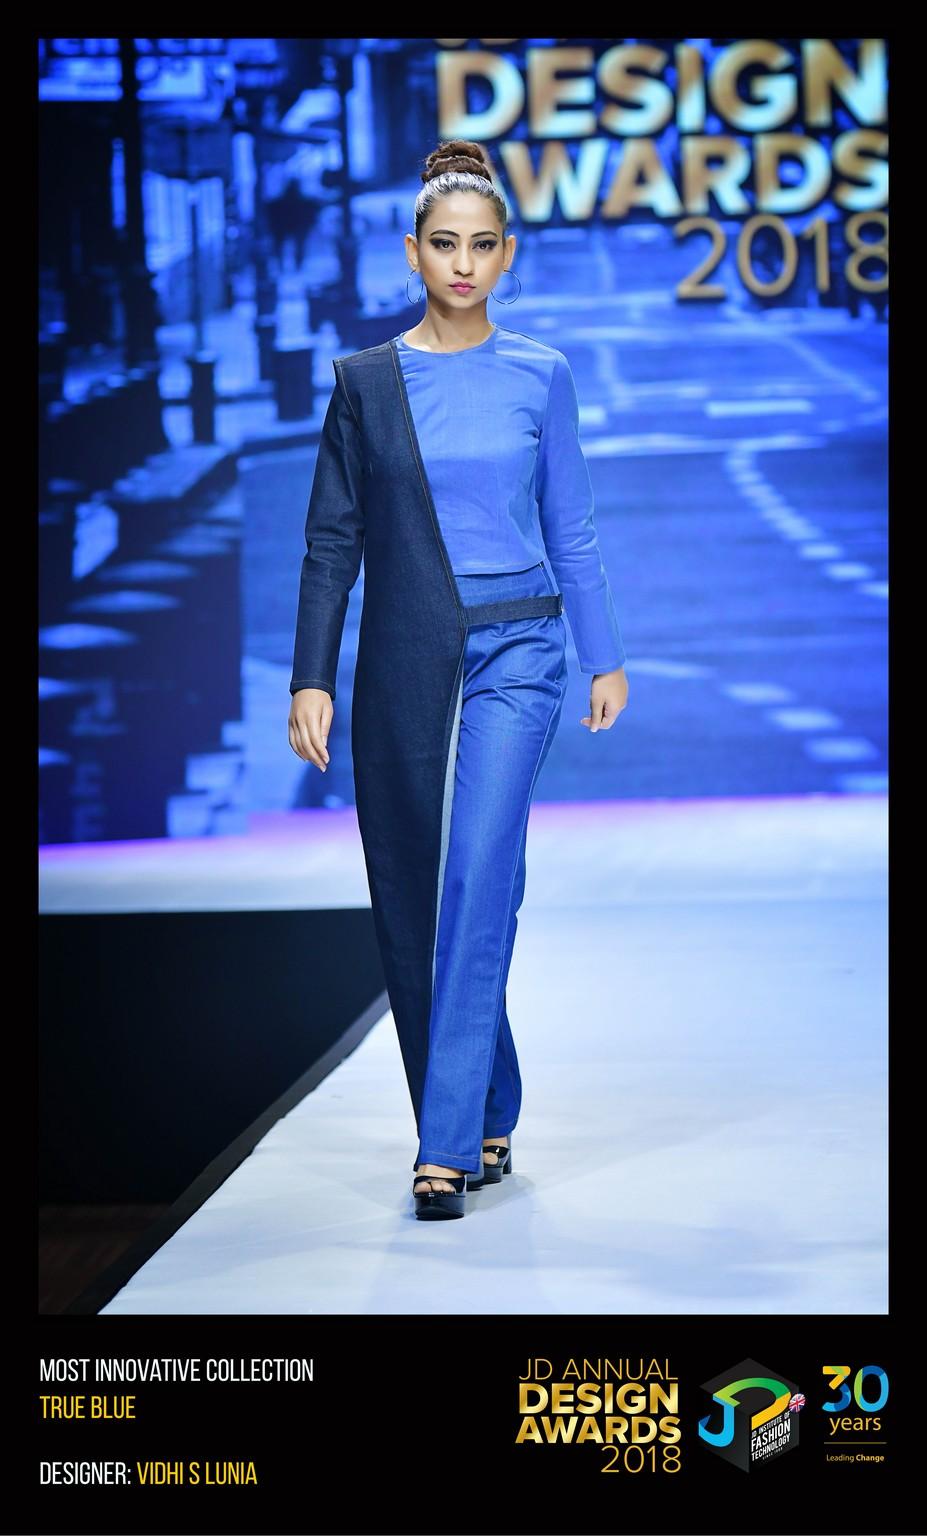 True Blue – Change – JD Annual Design Awards 2018 | Designer: Vidhi Lunia (ADFD 2015) | Photography : Jerin Nath (@jerin_nath) true blue - True Blue Photos JDW FB9 - True Blue – Change – JD Annual Design Awards 2018